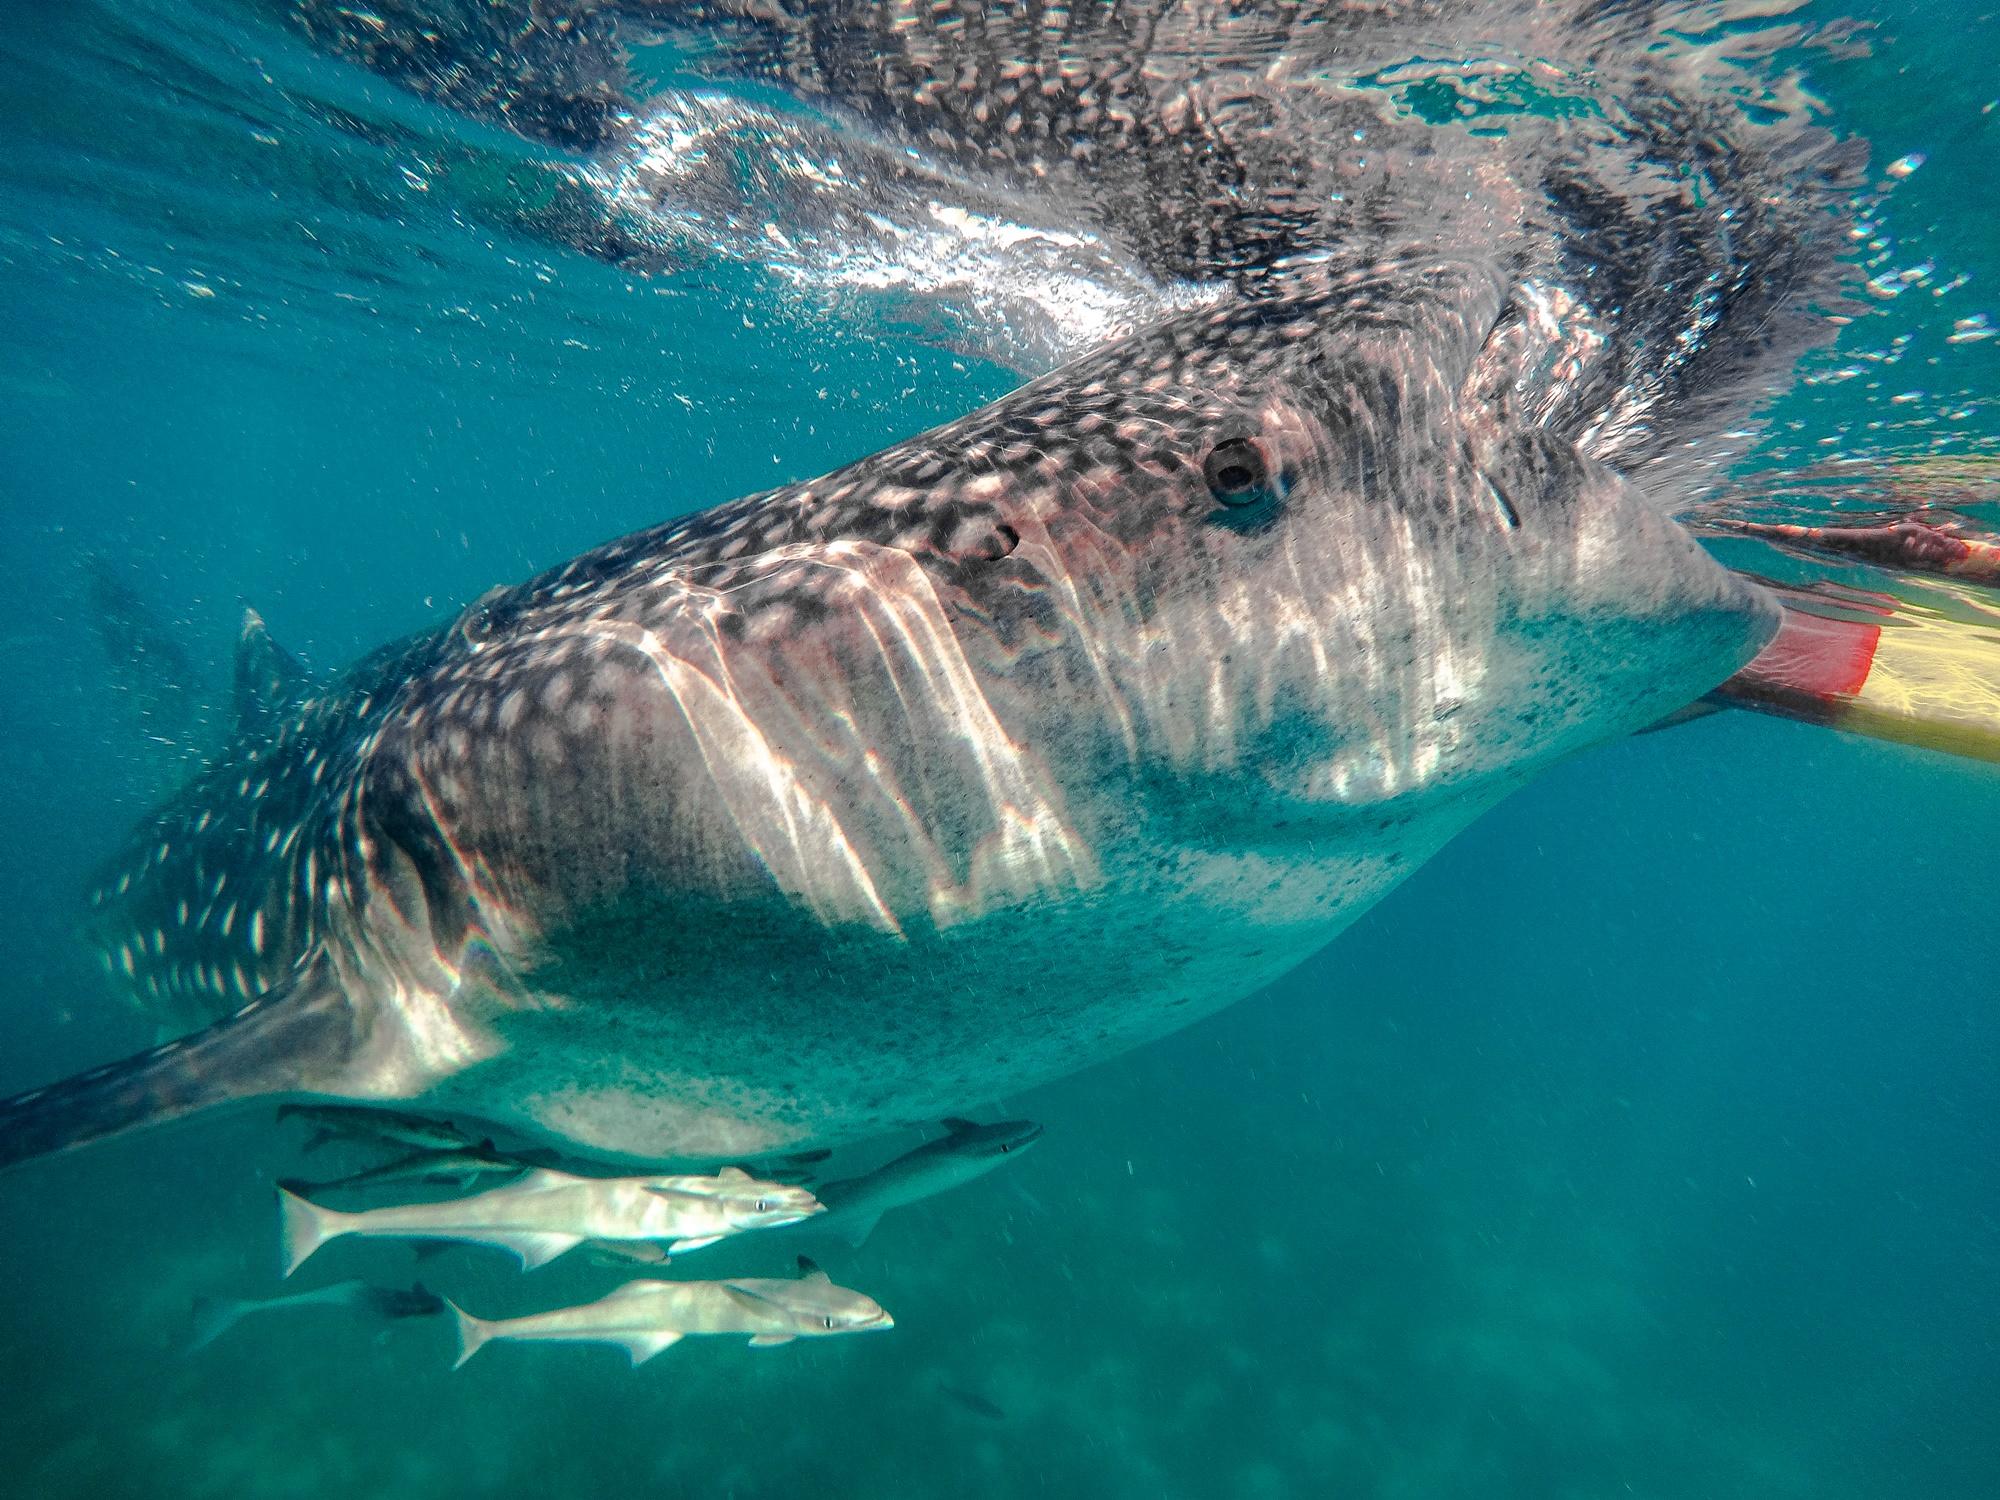 Whale Shark Feeding in Oslob | Badian Canyoneering Adventure + Whale Shark Encounter | Cebu Day Tour